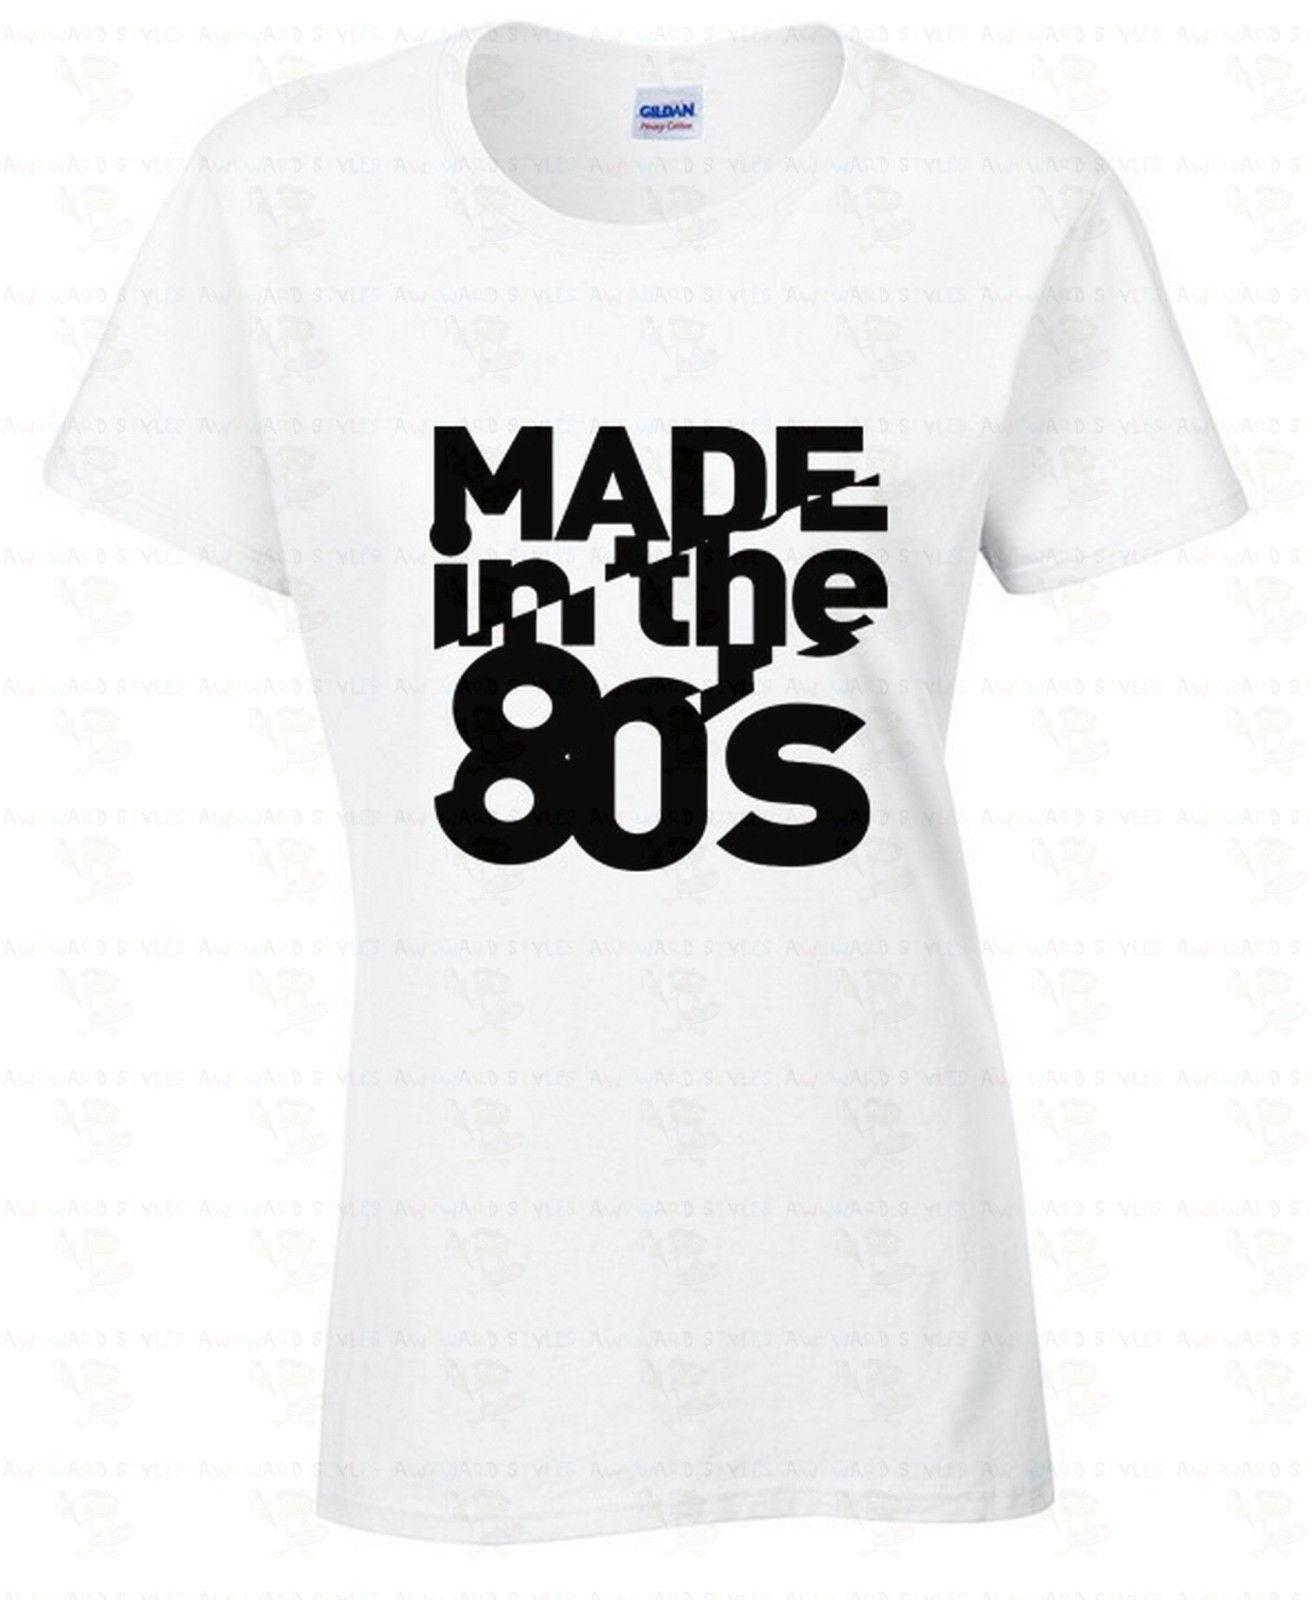 c35ab1ba MADE In The 80's WOMEN T SHIRT Humor Ladies Shirt Birthday Gift Retro  College Harajuku T Shirt Women Short Sleeve Top Tee-in T-Shirts from Women's  Clothing ...